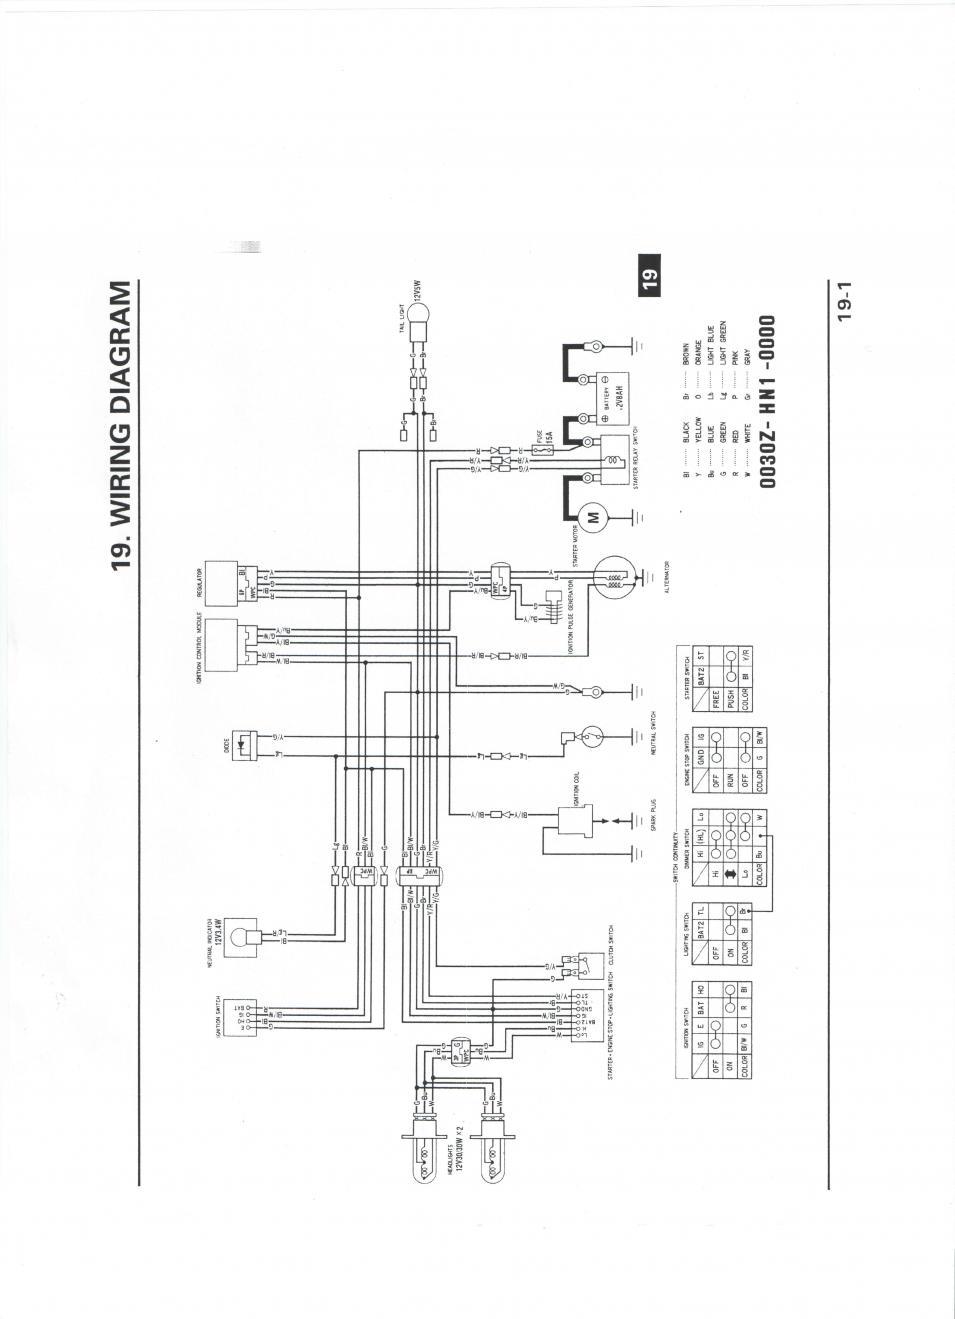 WRG-9165] Honda Trx400ex Wiring Diagram on